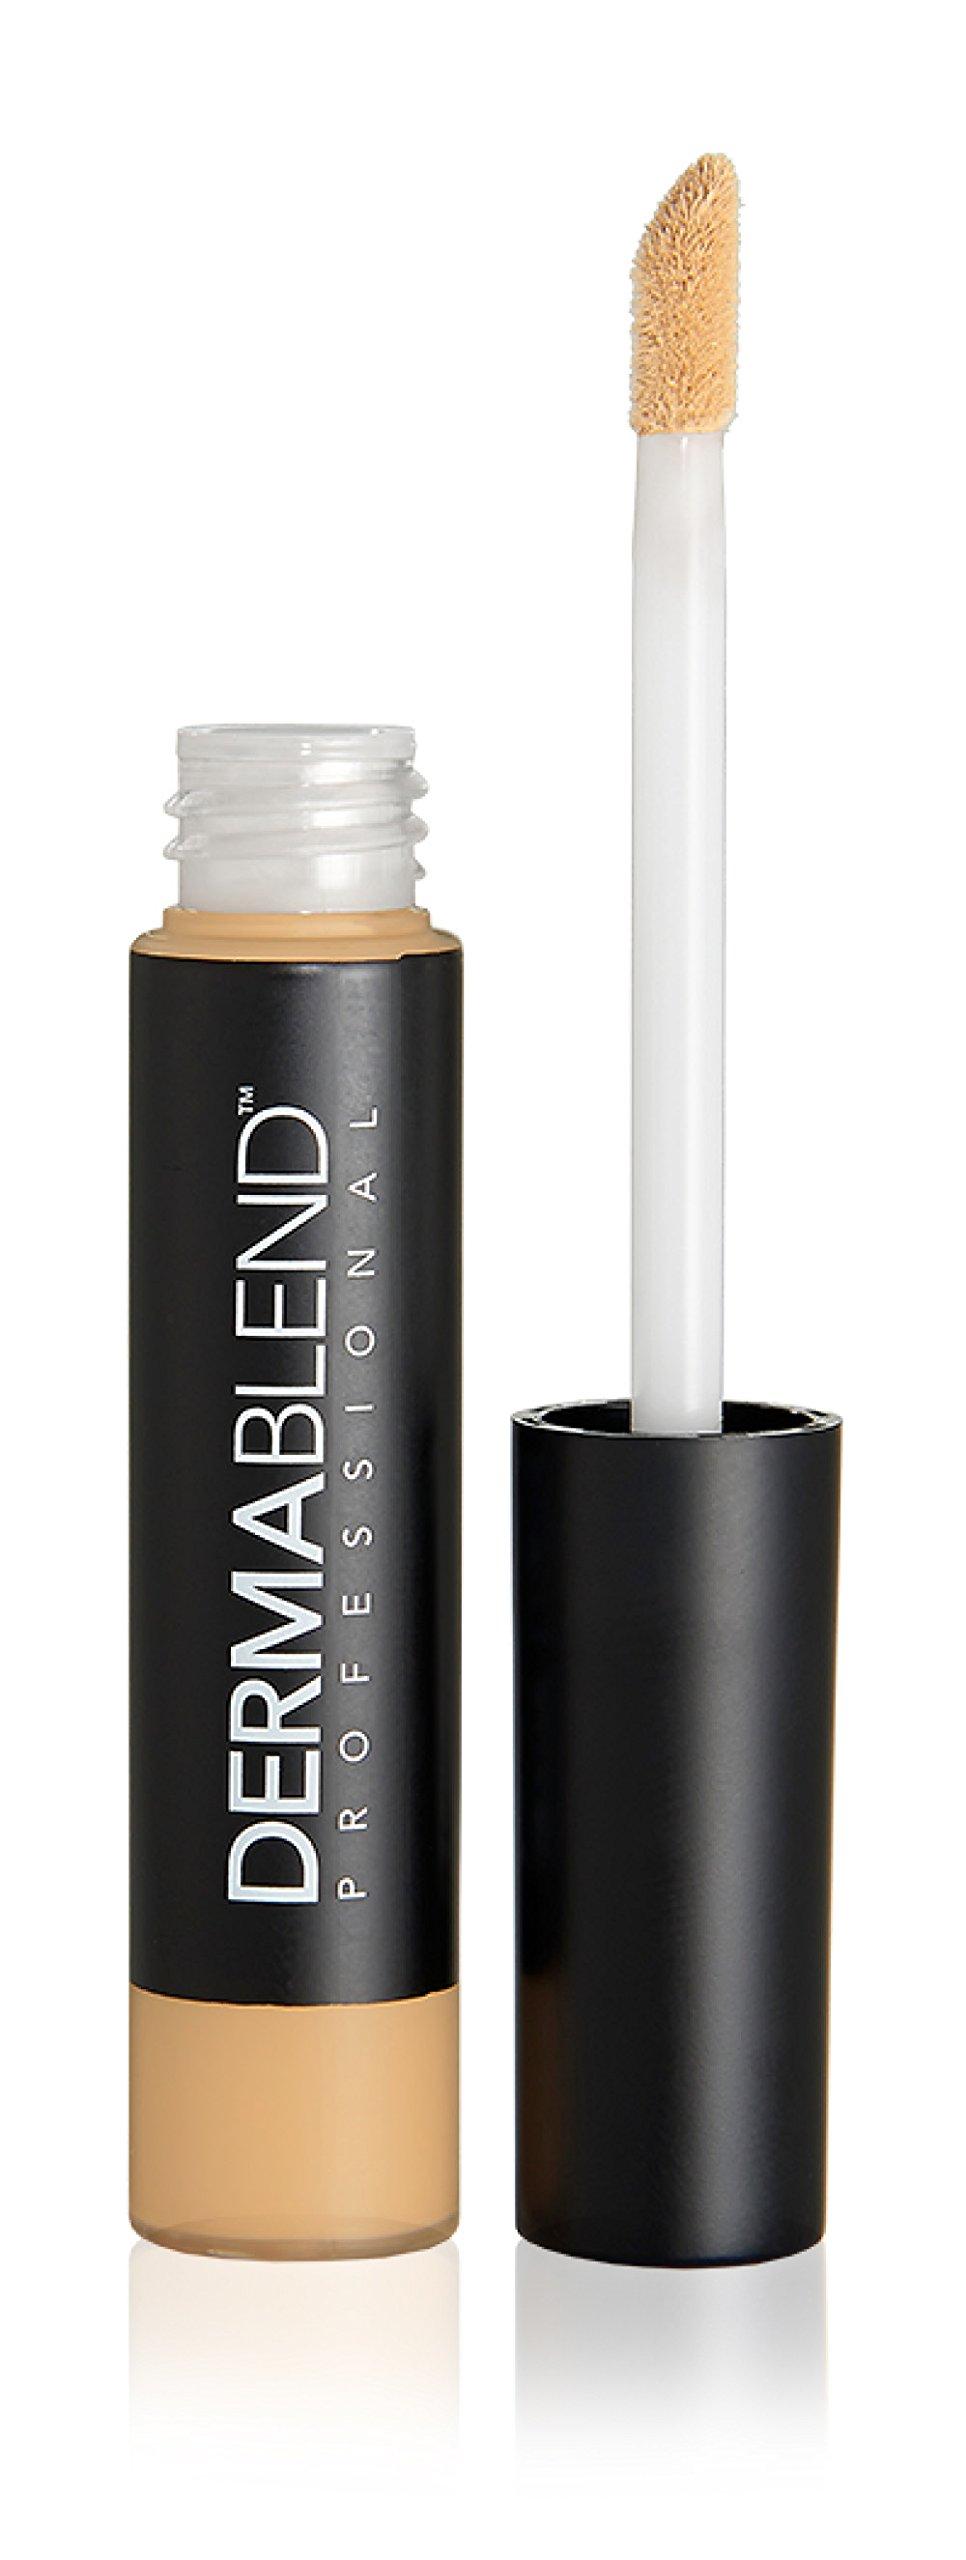 Dermablend Smooth Liquid Camo Concealer, Hydrating Liquid Concealer Makeup, 0.2 fl. Oz. by Dermablend